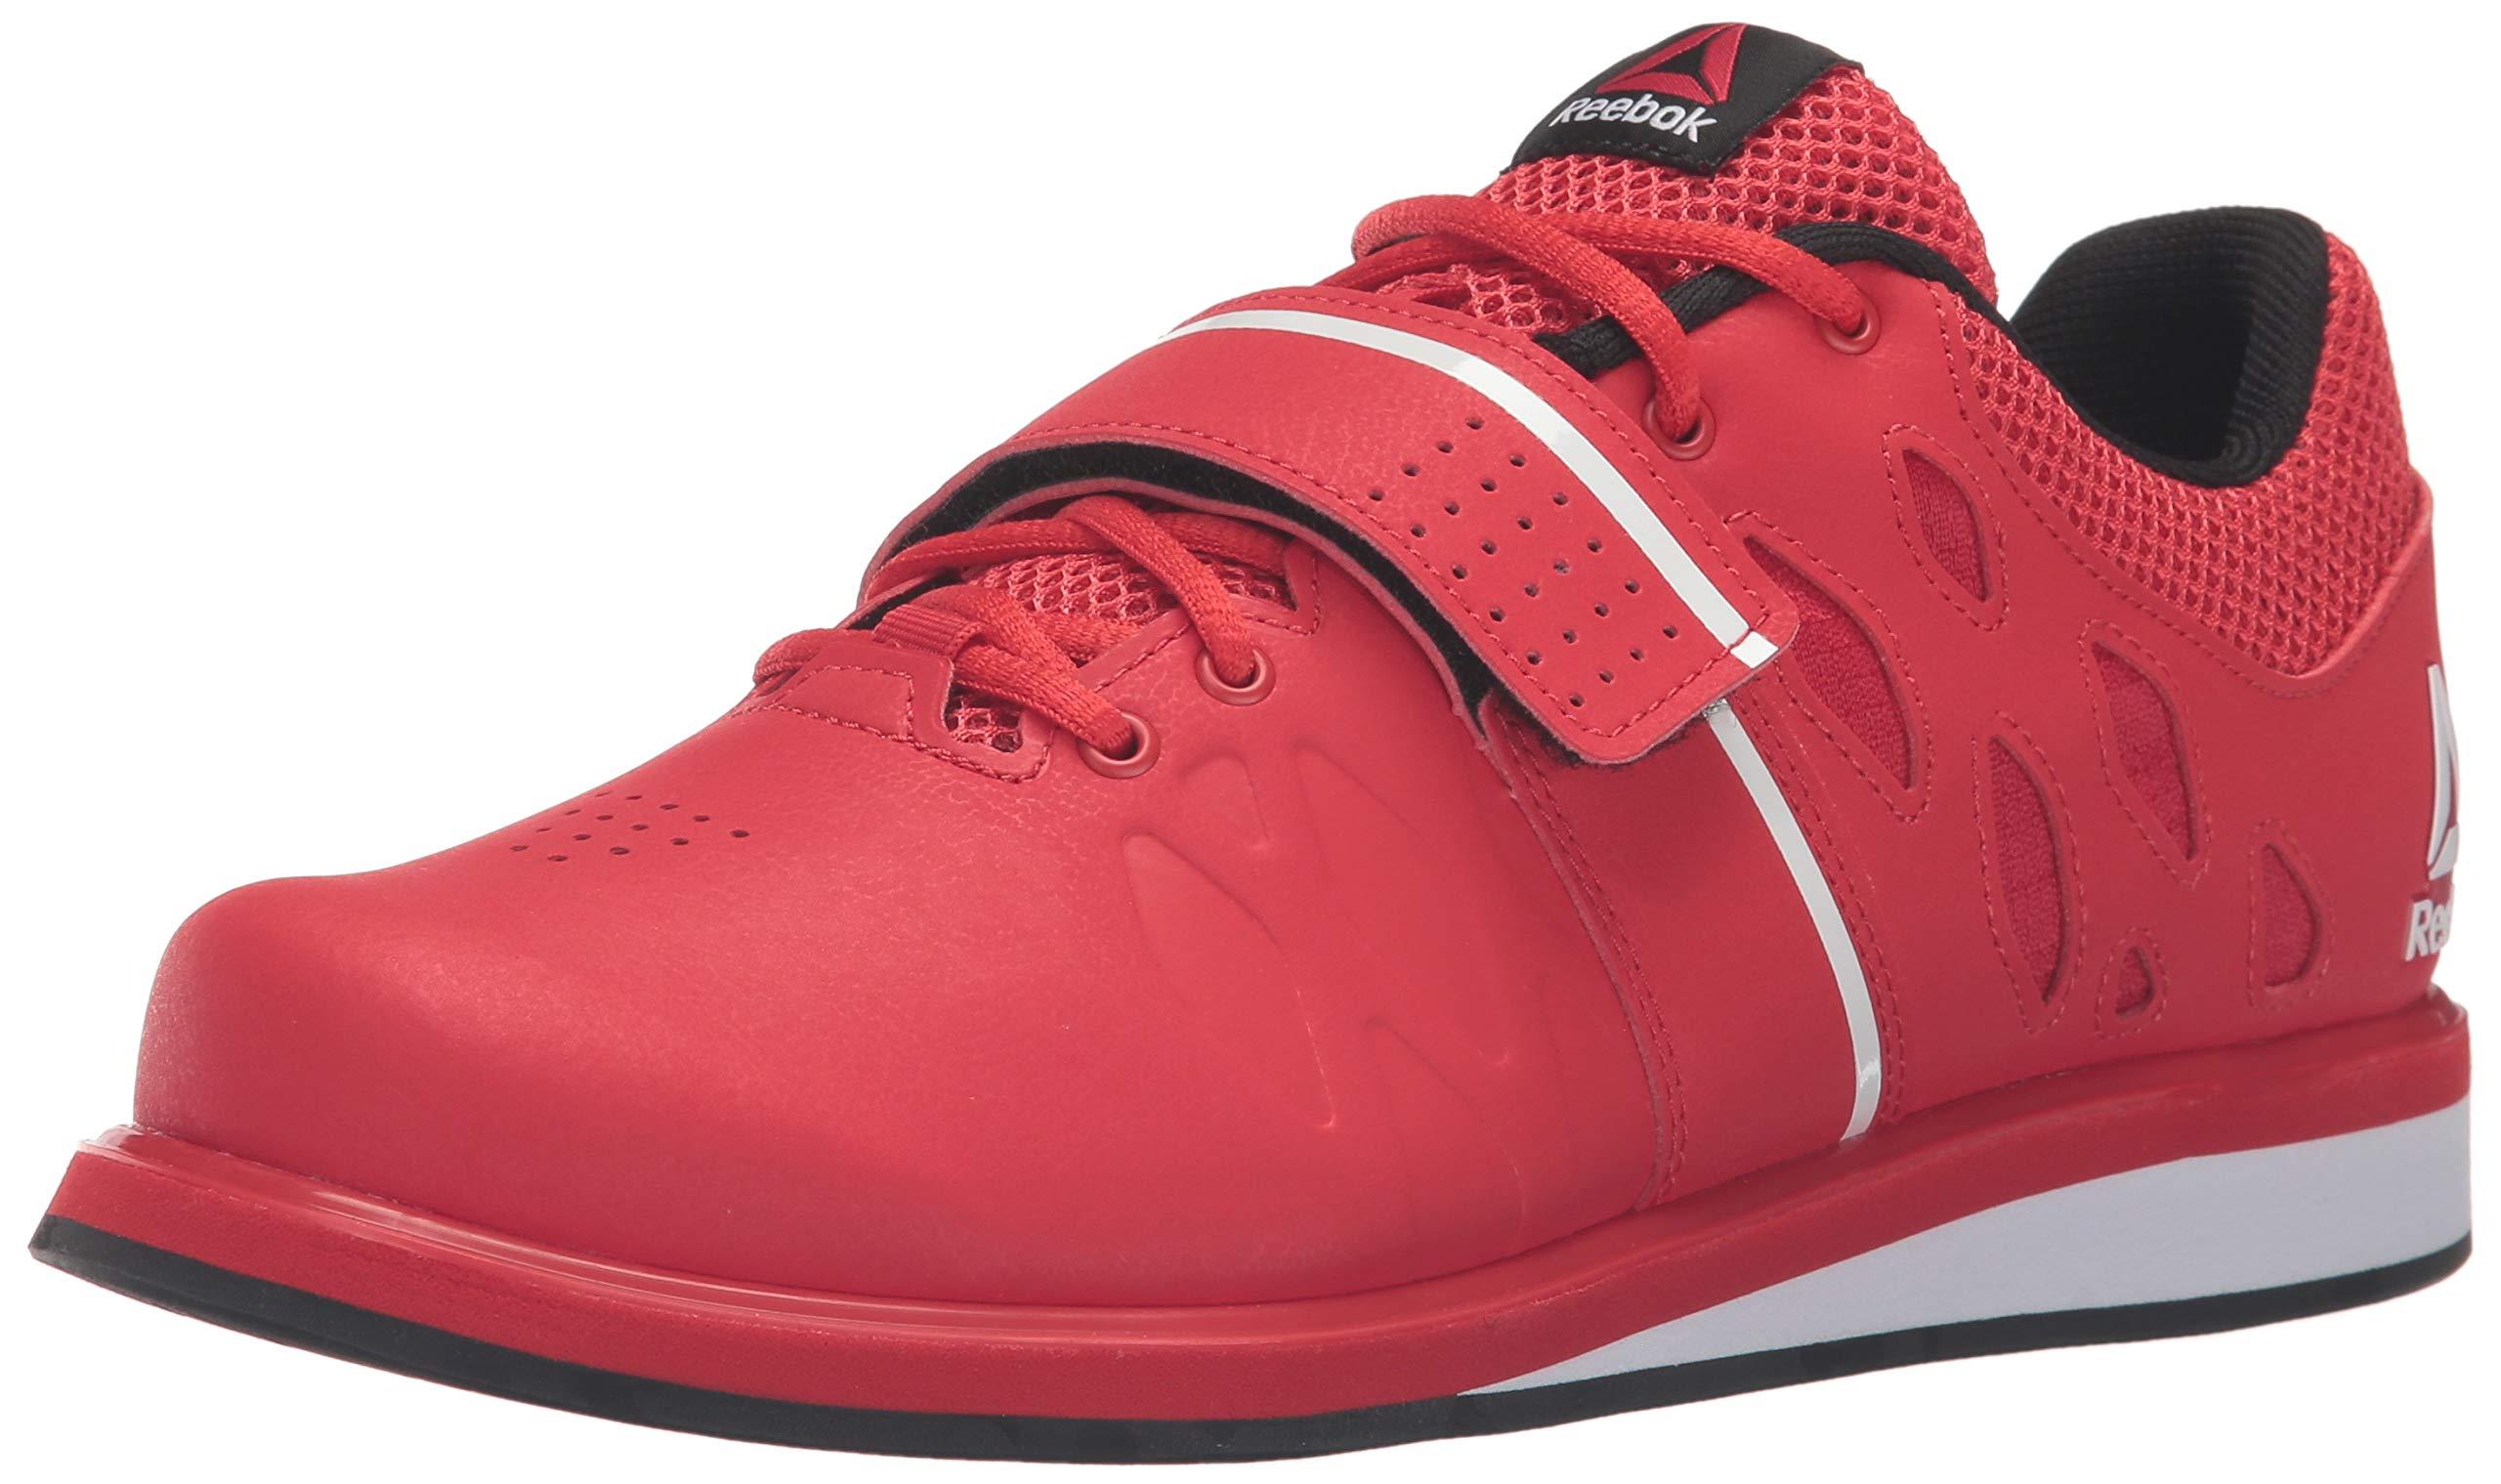 Reebok Men's Lifter Pr Cross-Trainer Shoe, Primal Red/Black/White, 6.5 M US